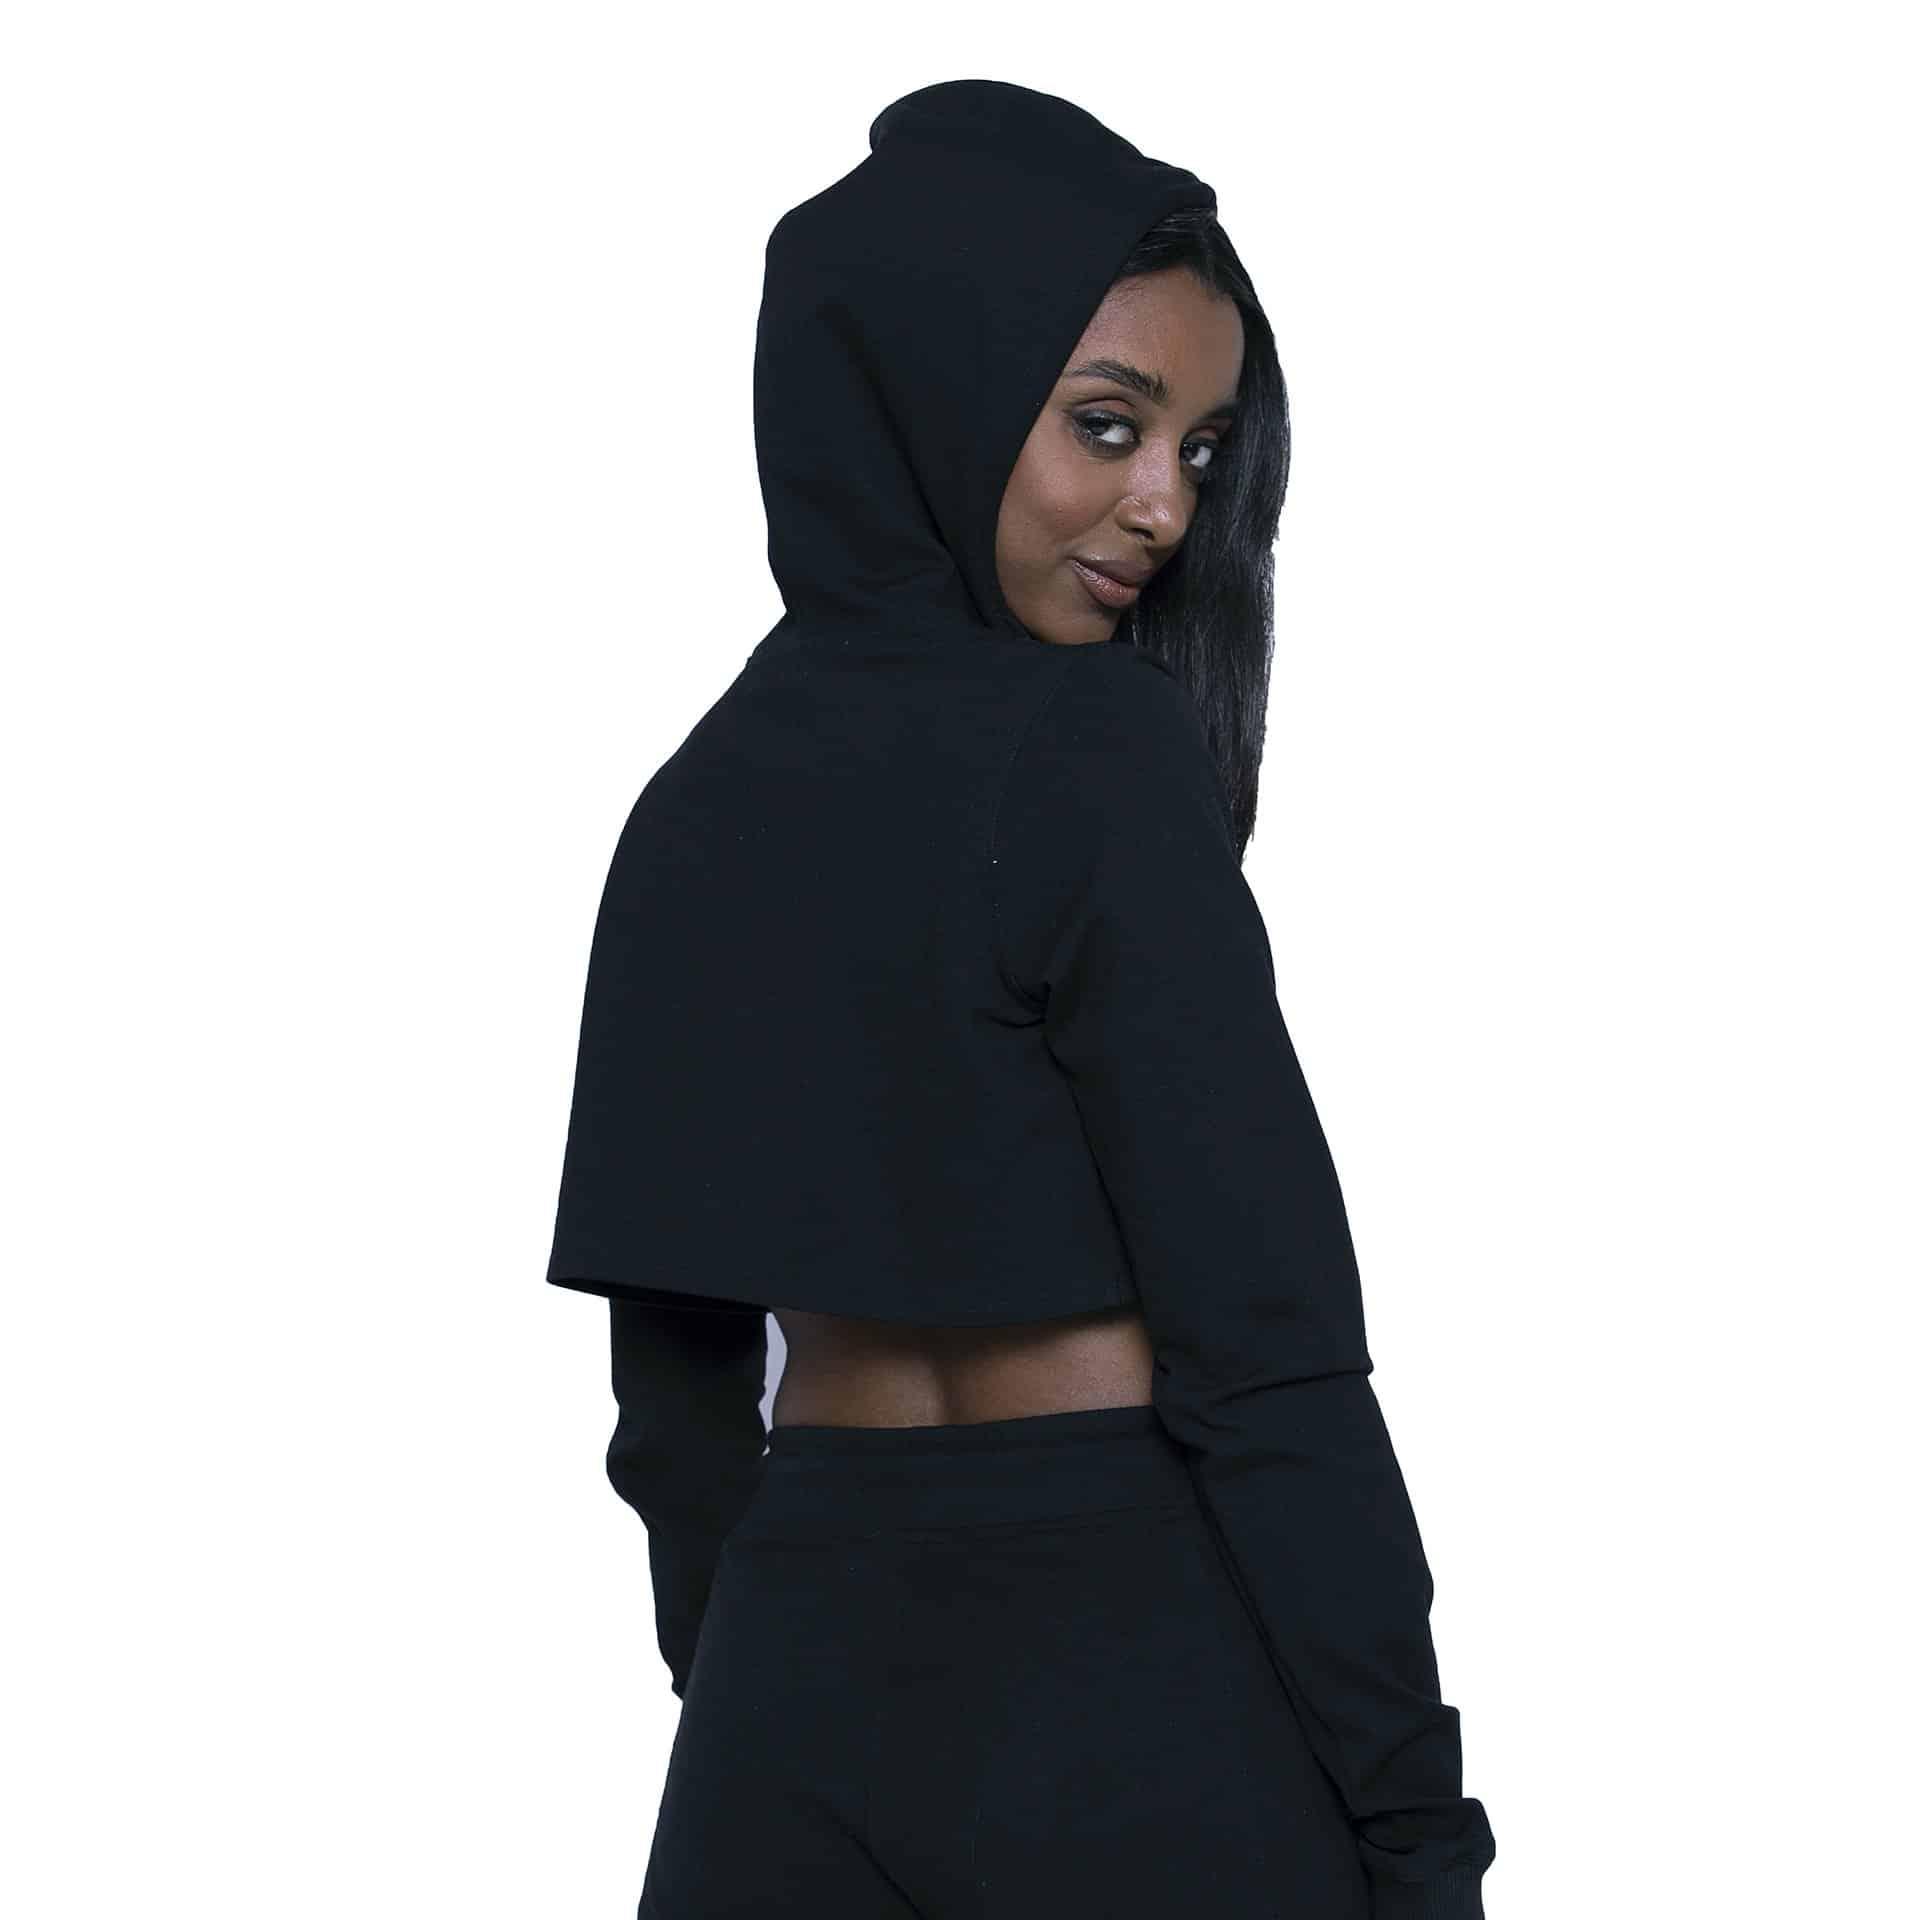 Grind – Women's Crop Top hoodie